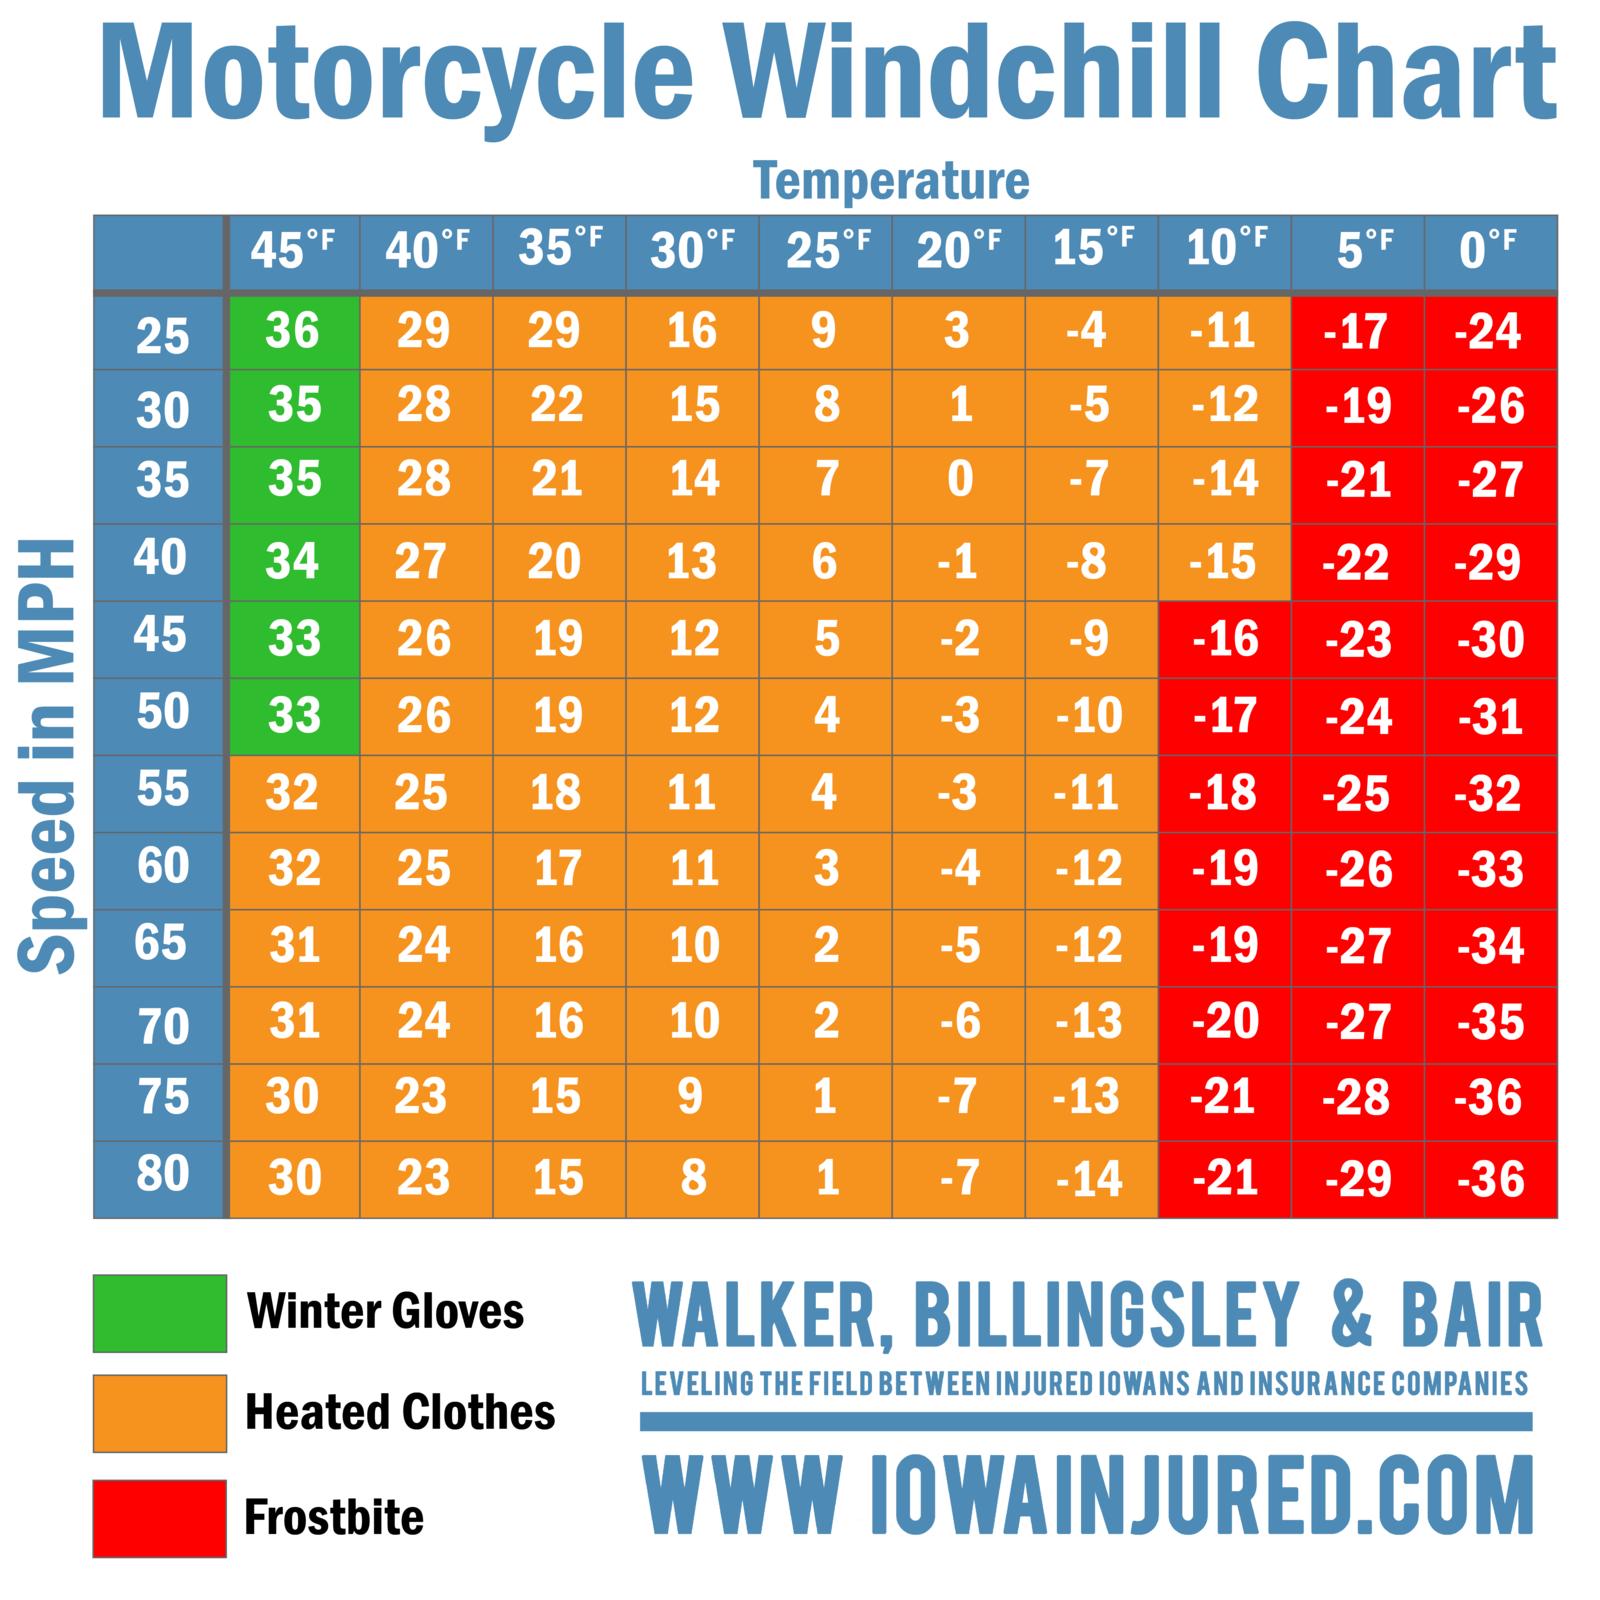 Iowa Motorcycle Windchill chart Iowa Injured